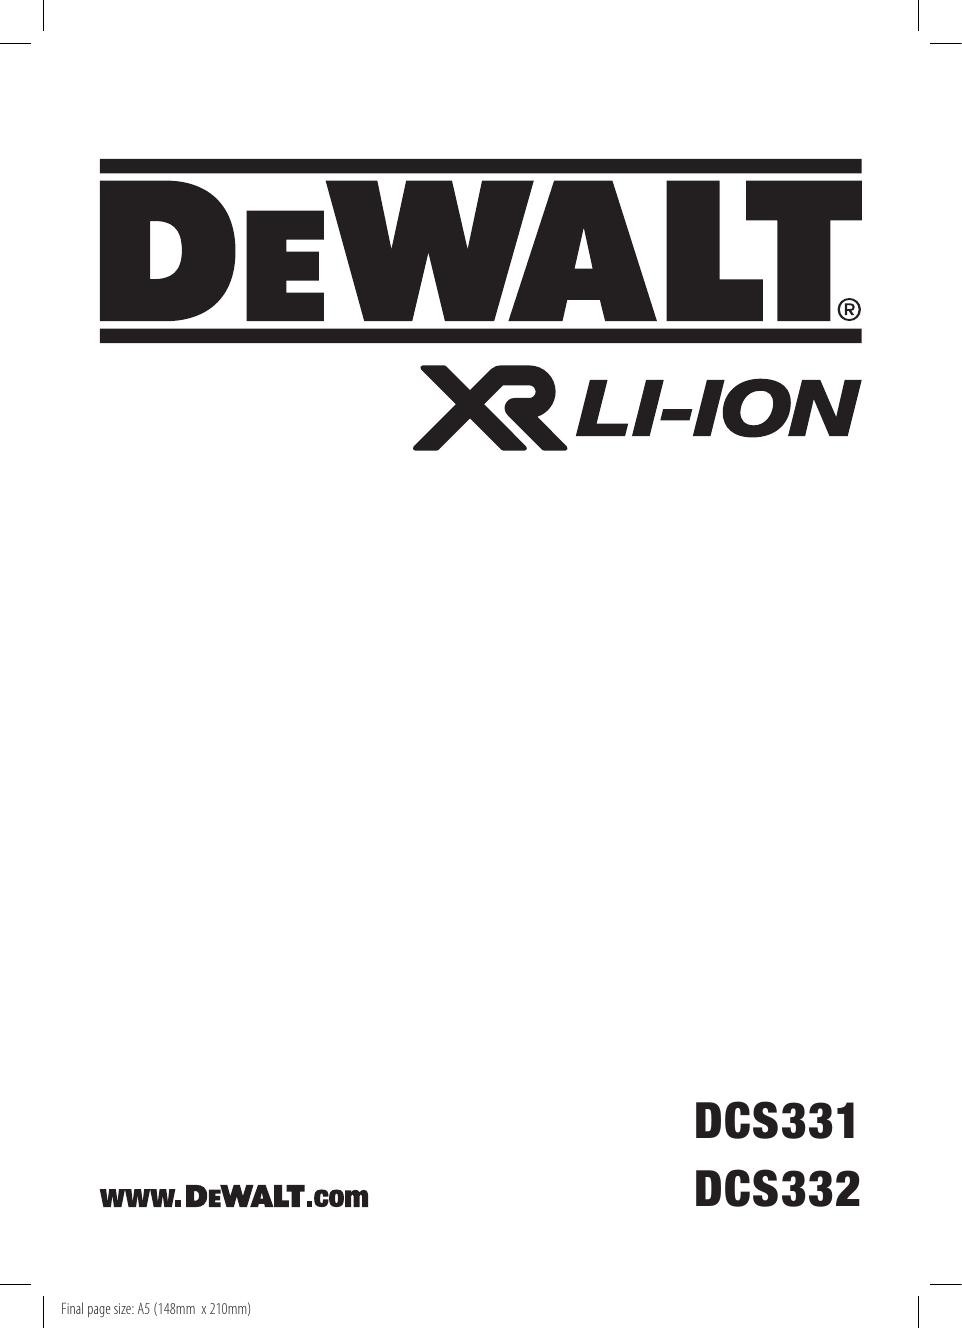 DeWalt DCS331 CORDLESS JIGSAW Type 10 instruction manual